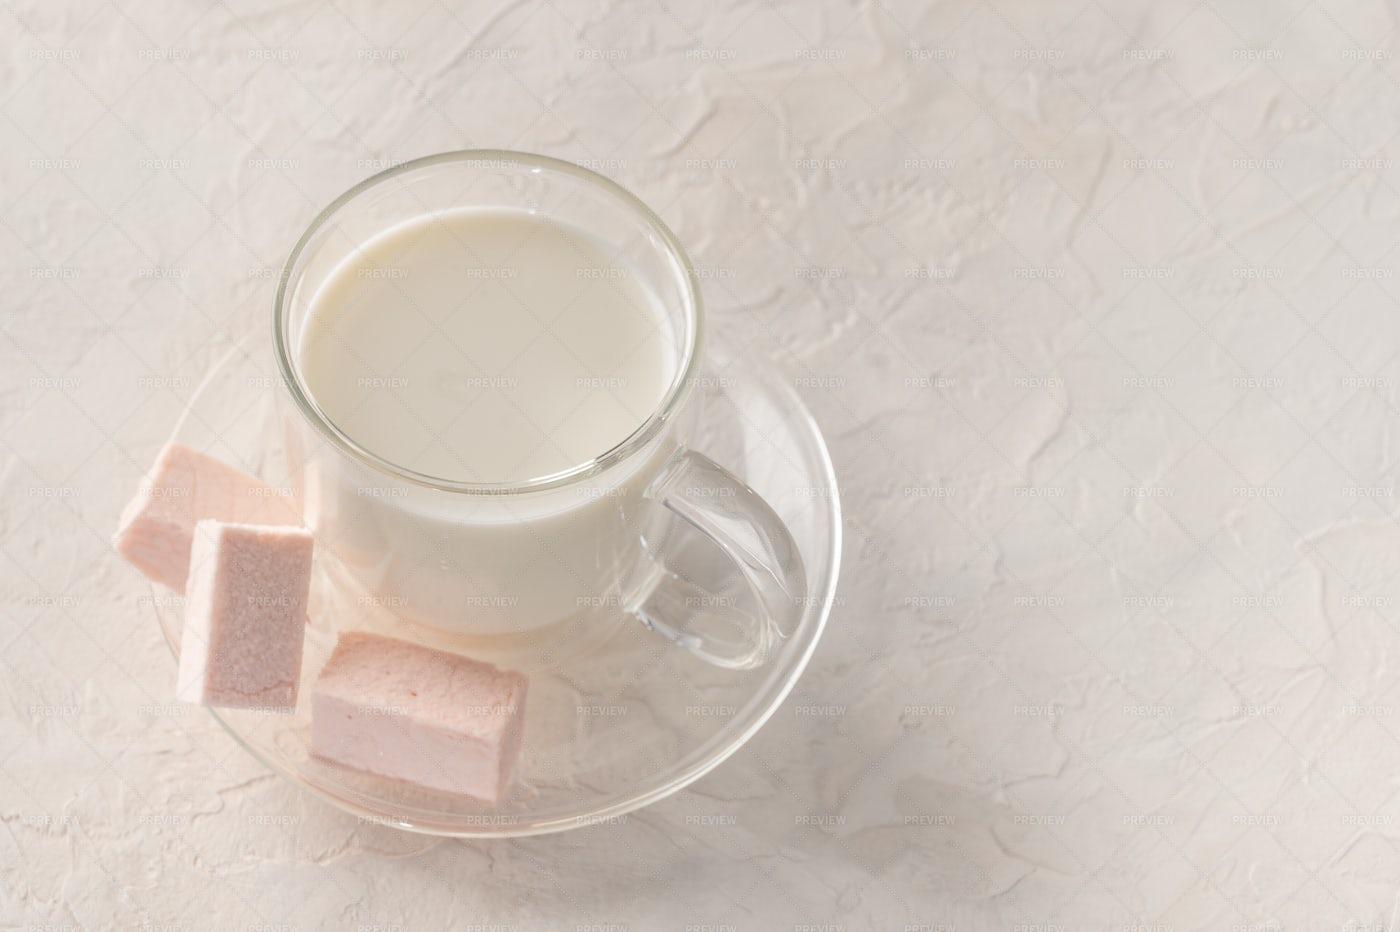 Milk In Transparent Cup: Stock Photos